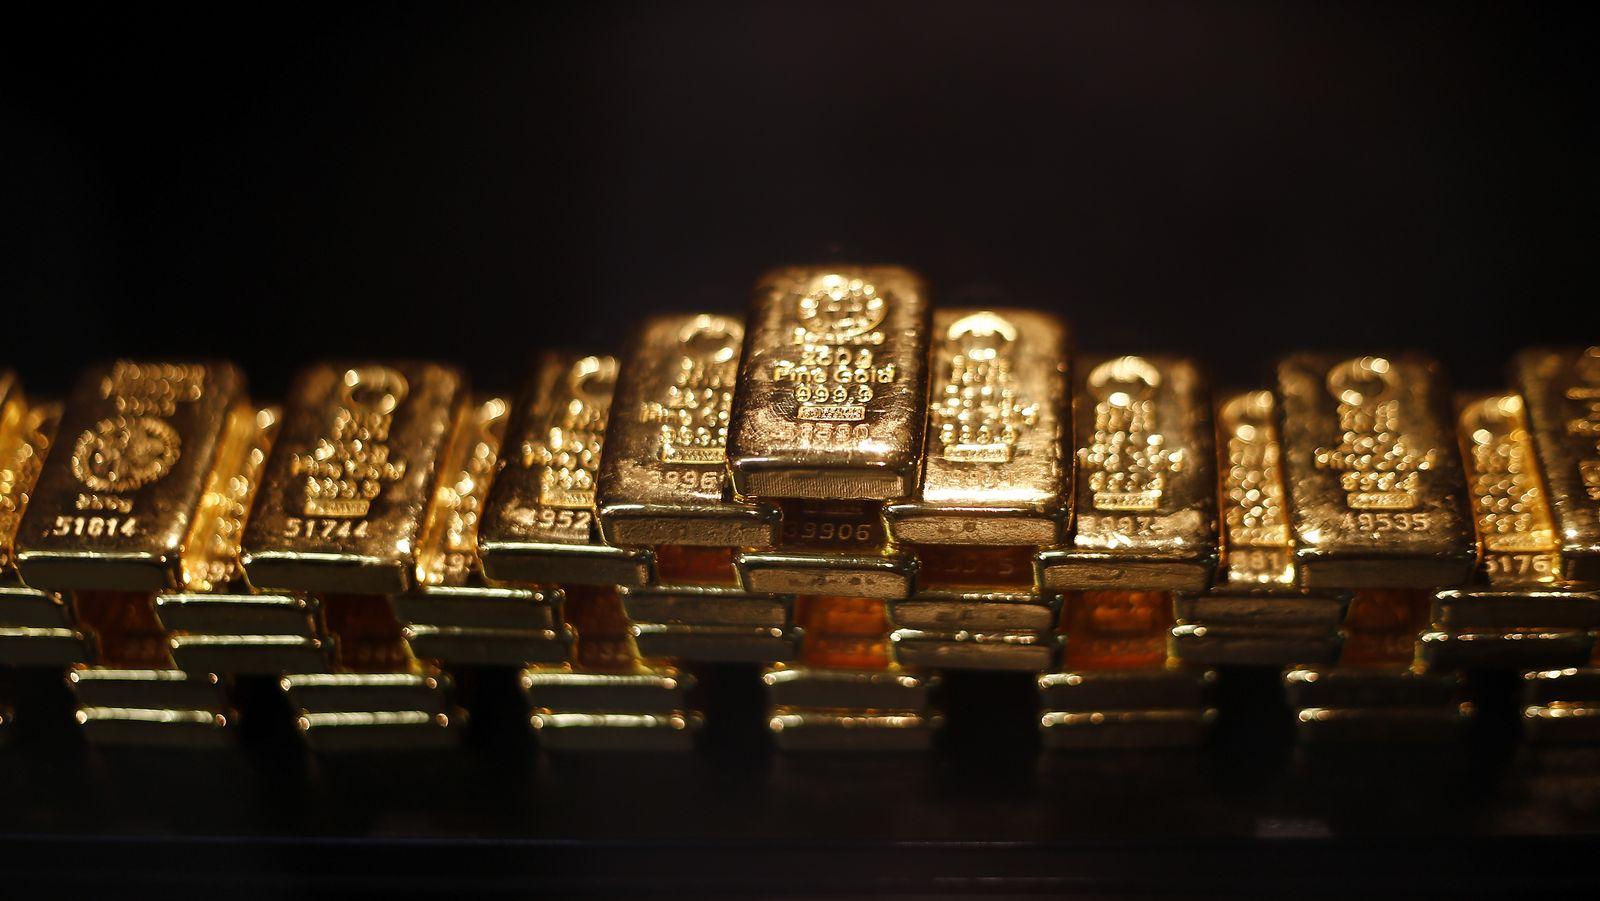 Gold / Goldbarren / Barren